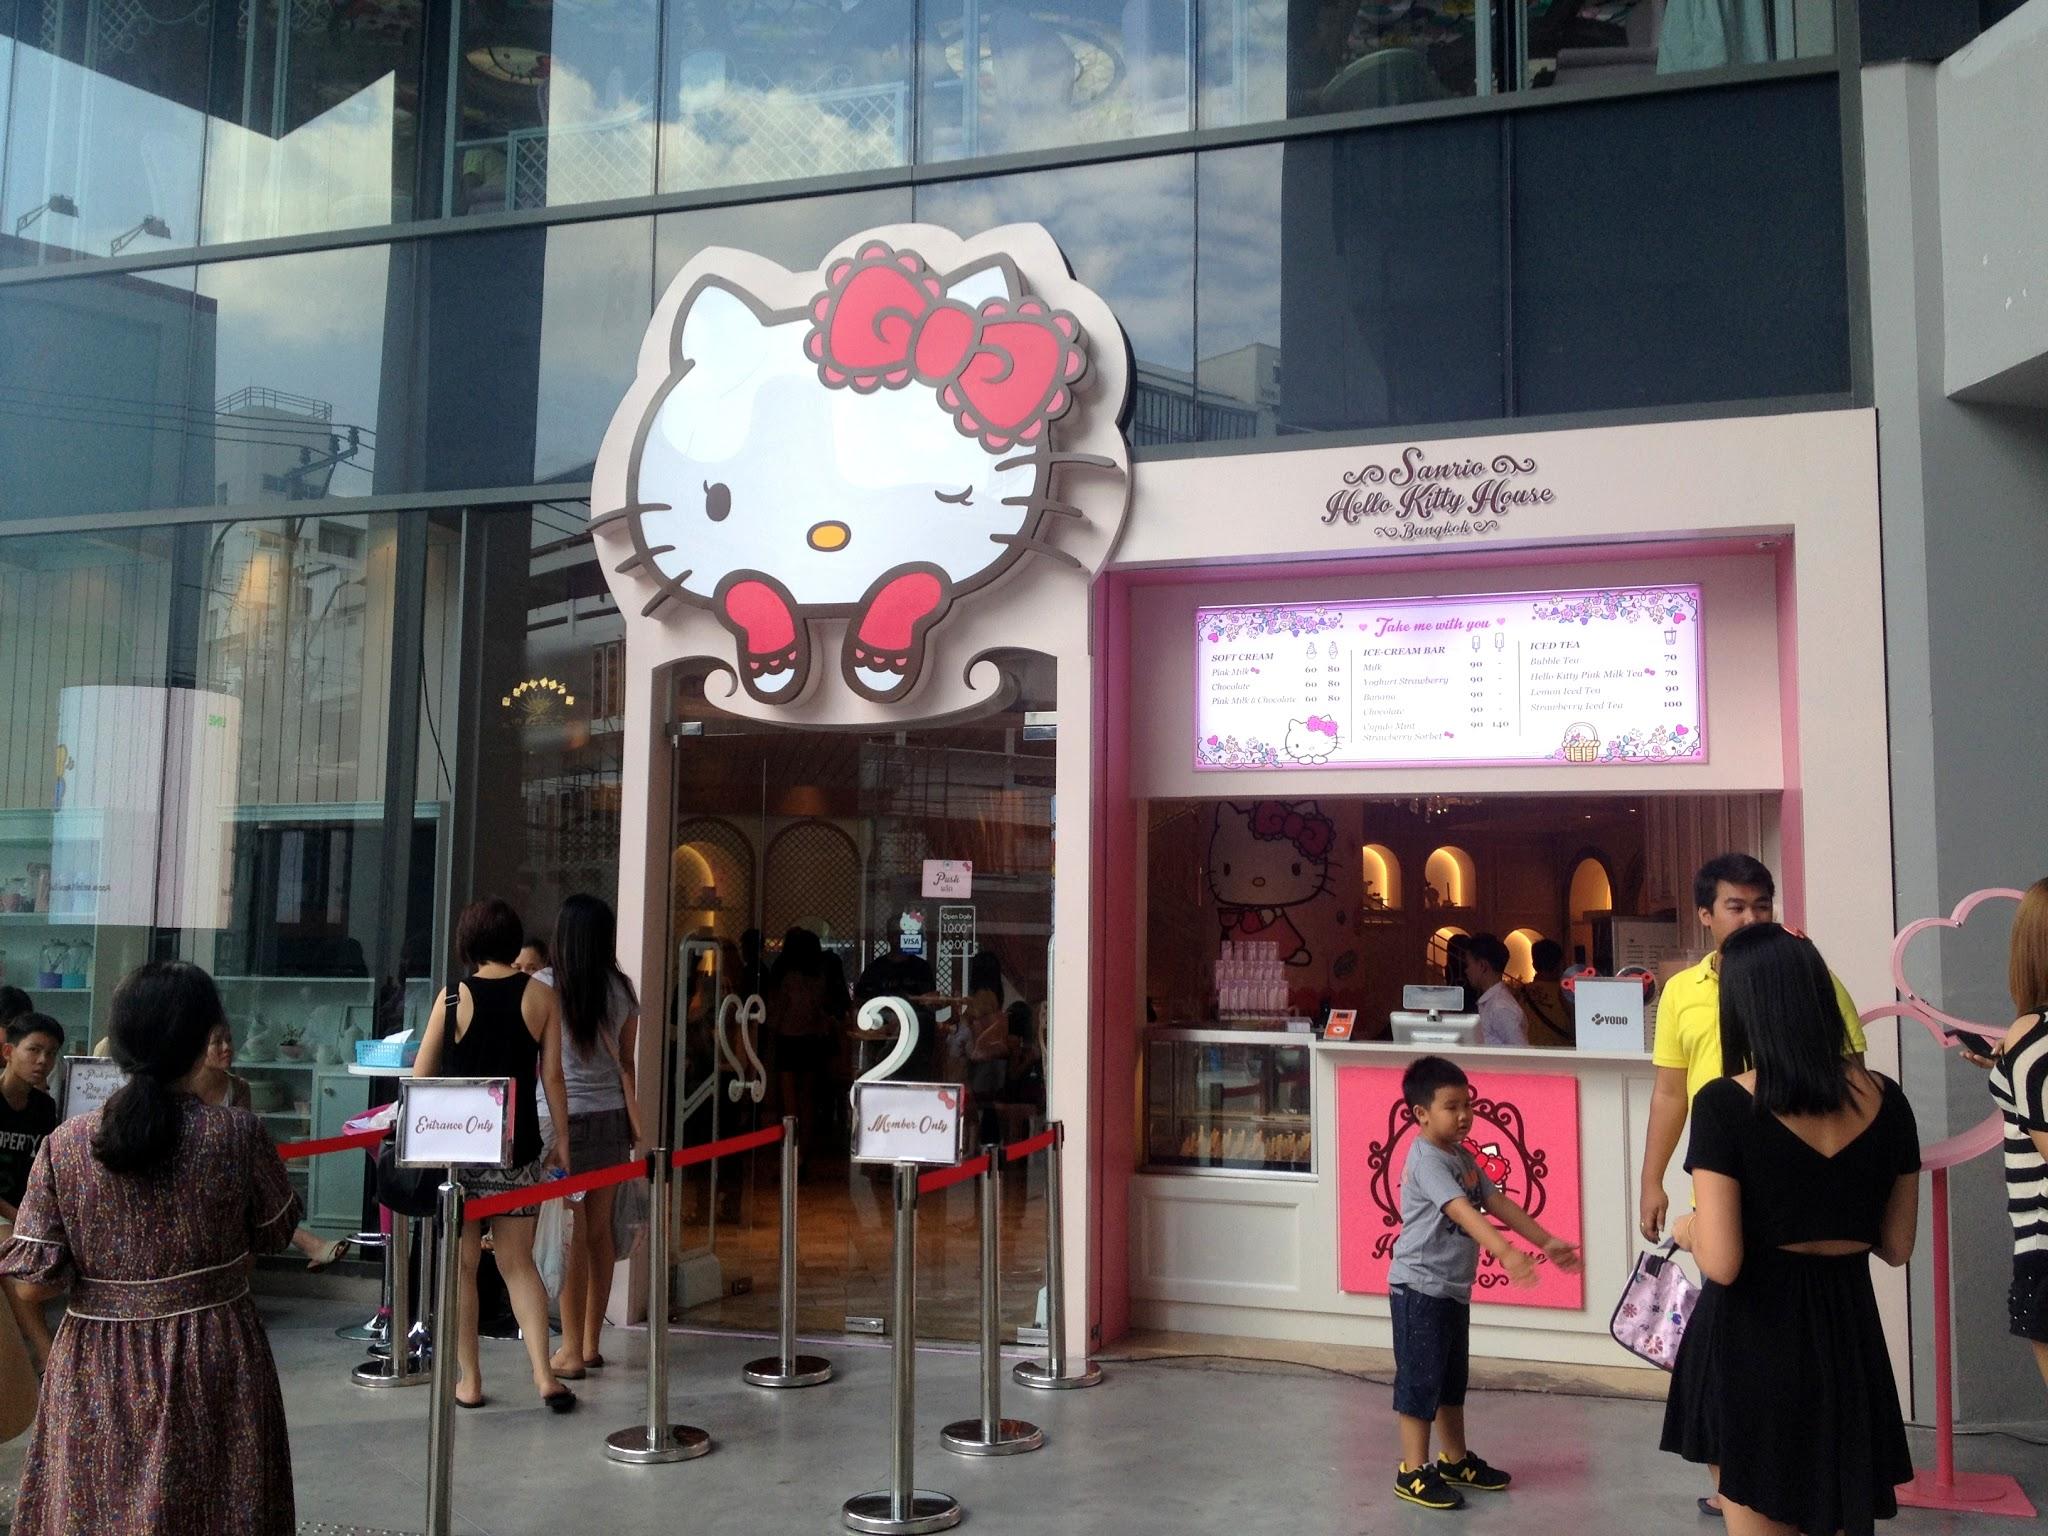 Where Is The Hello Kitty House Located thailand travel blog - bangkok sanrio hello kitty house - adriennehoxy